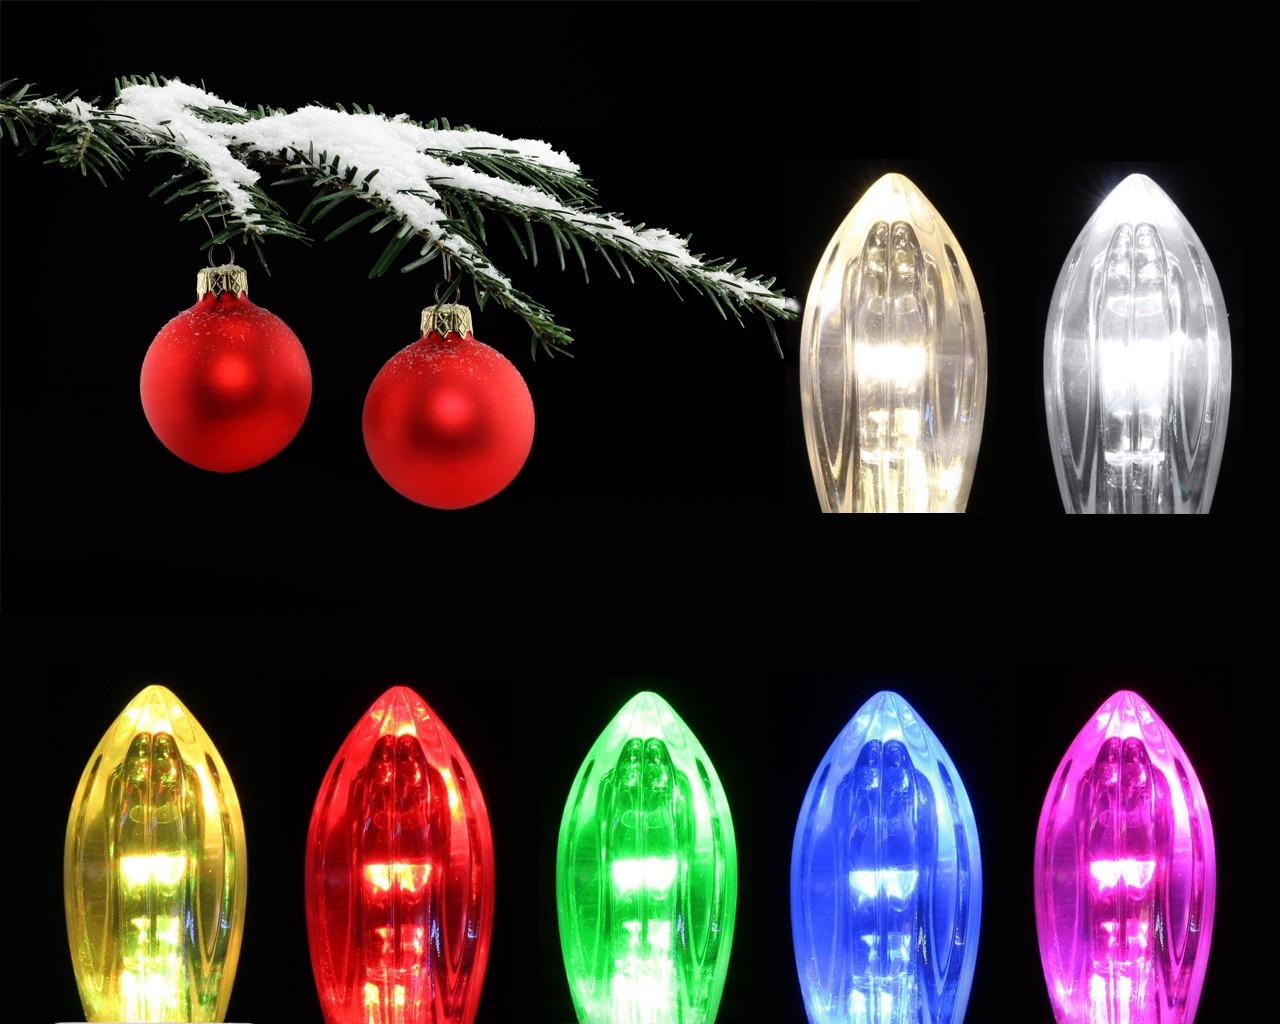 30 kabellose led funk kerzen lichterkette christbaumbeleuchtung weihnachtskerzen ebay. Black Bedroom Furniture Sets. Home Design Ideas